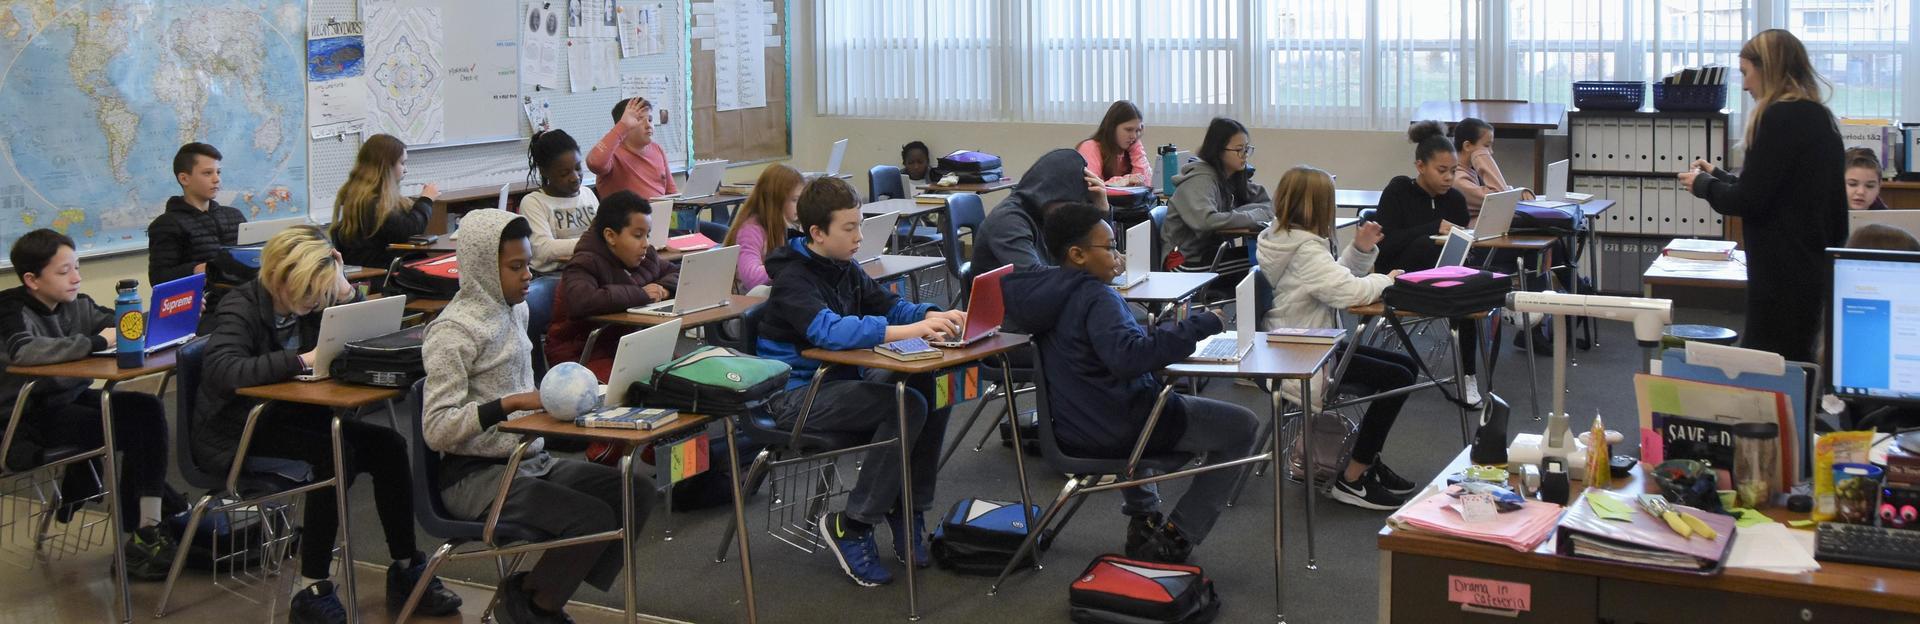 A junior high classroom